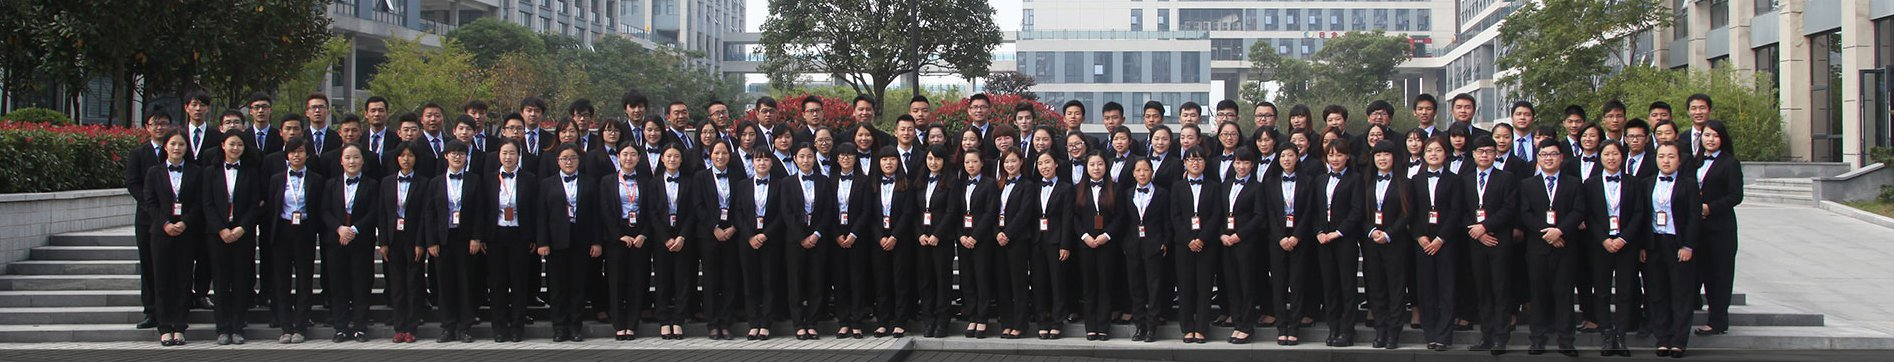 www.qytgroup.cn